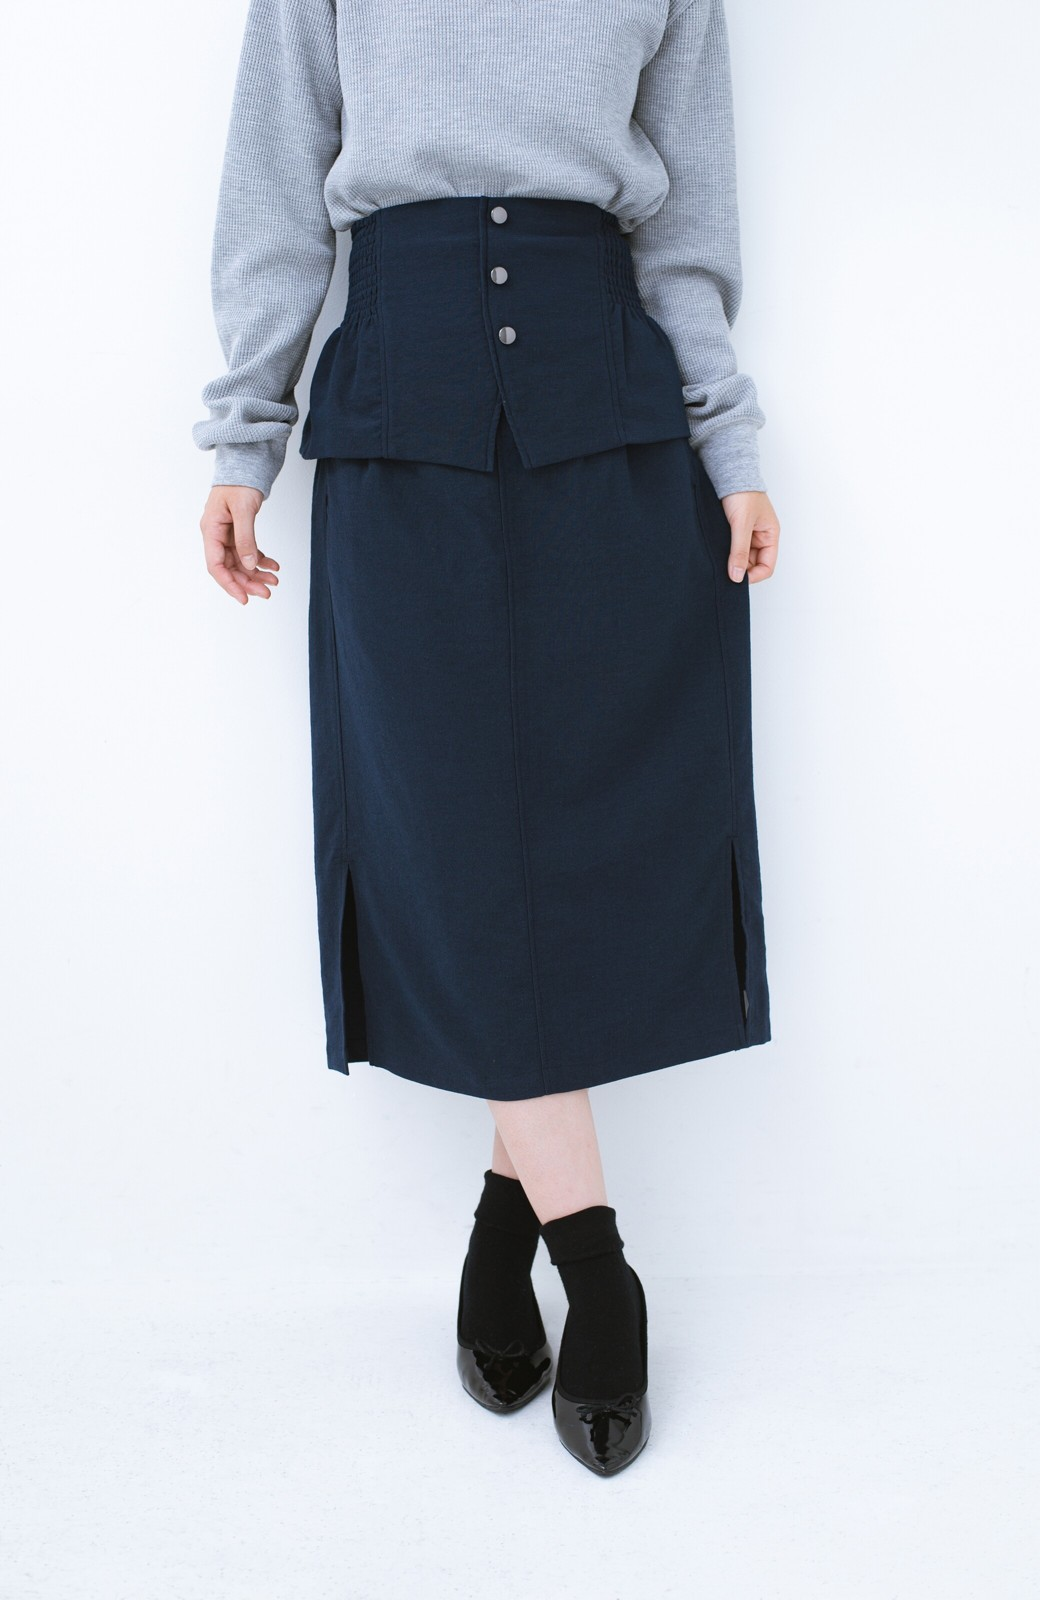 haco!  腹巻きとは呼ばせない ブルー期も華やかに過ごせる消臭加工裏地付きフリルデザインスカートセット【ブルー期】女の子バンザイ!プロジェクト <ネイビー>の商品写真9